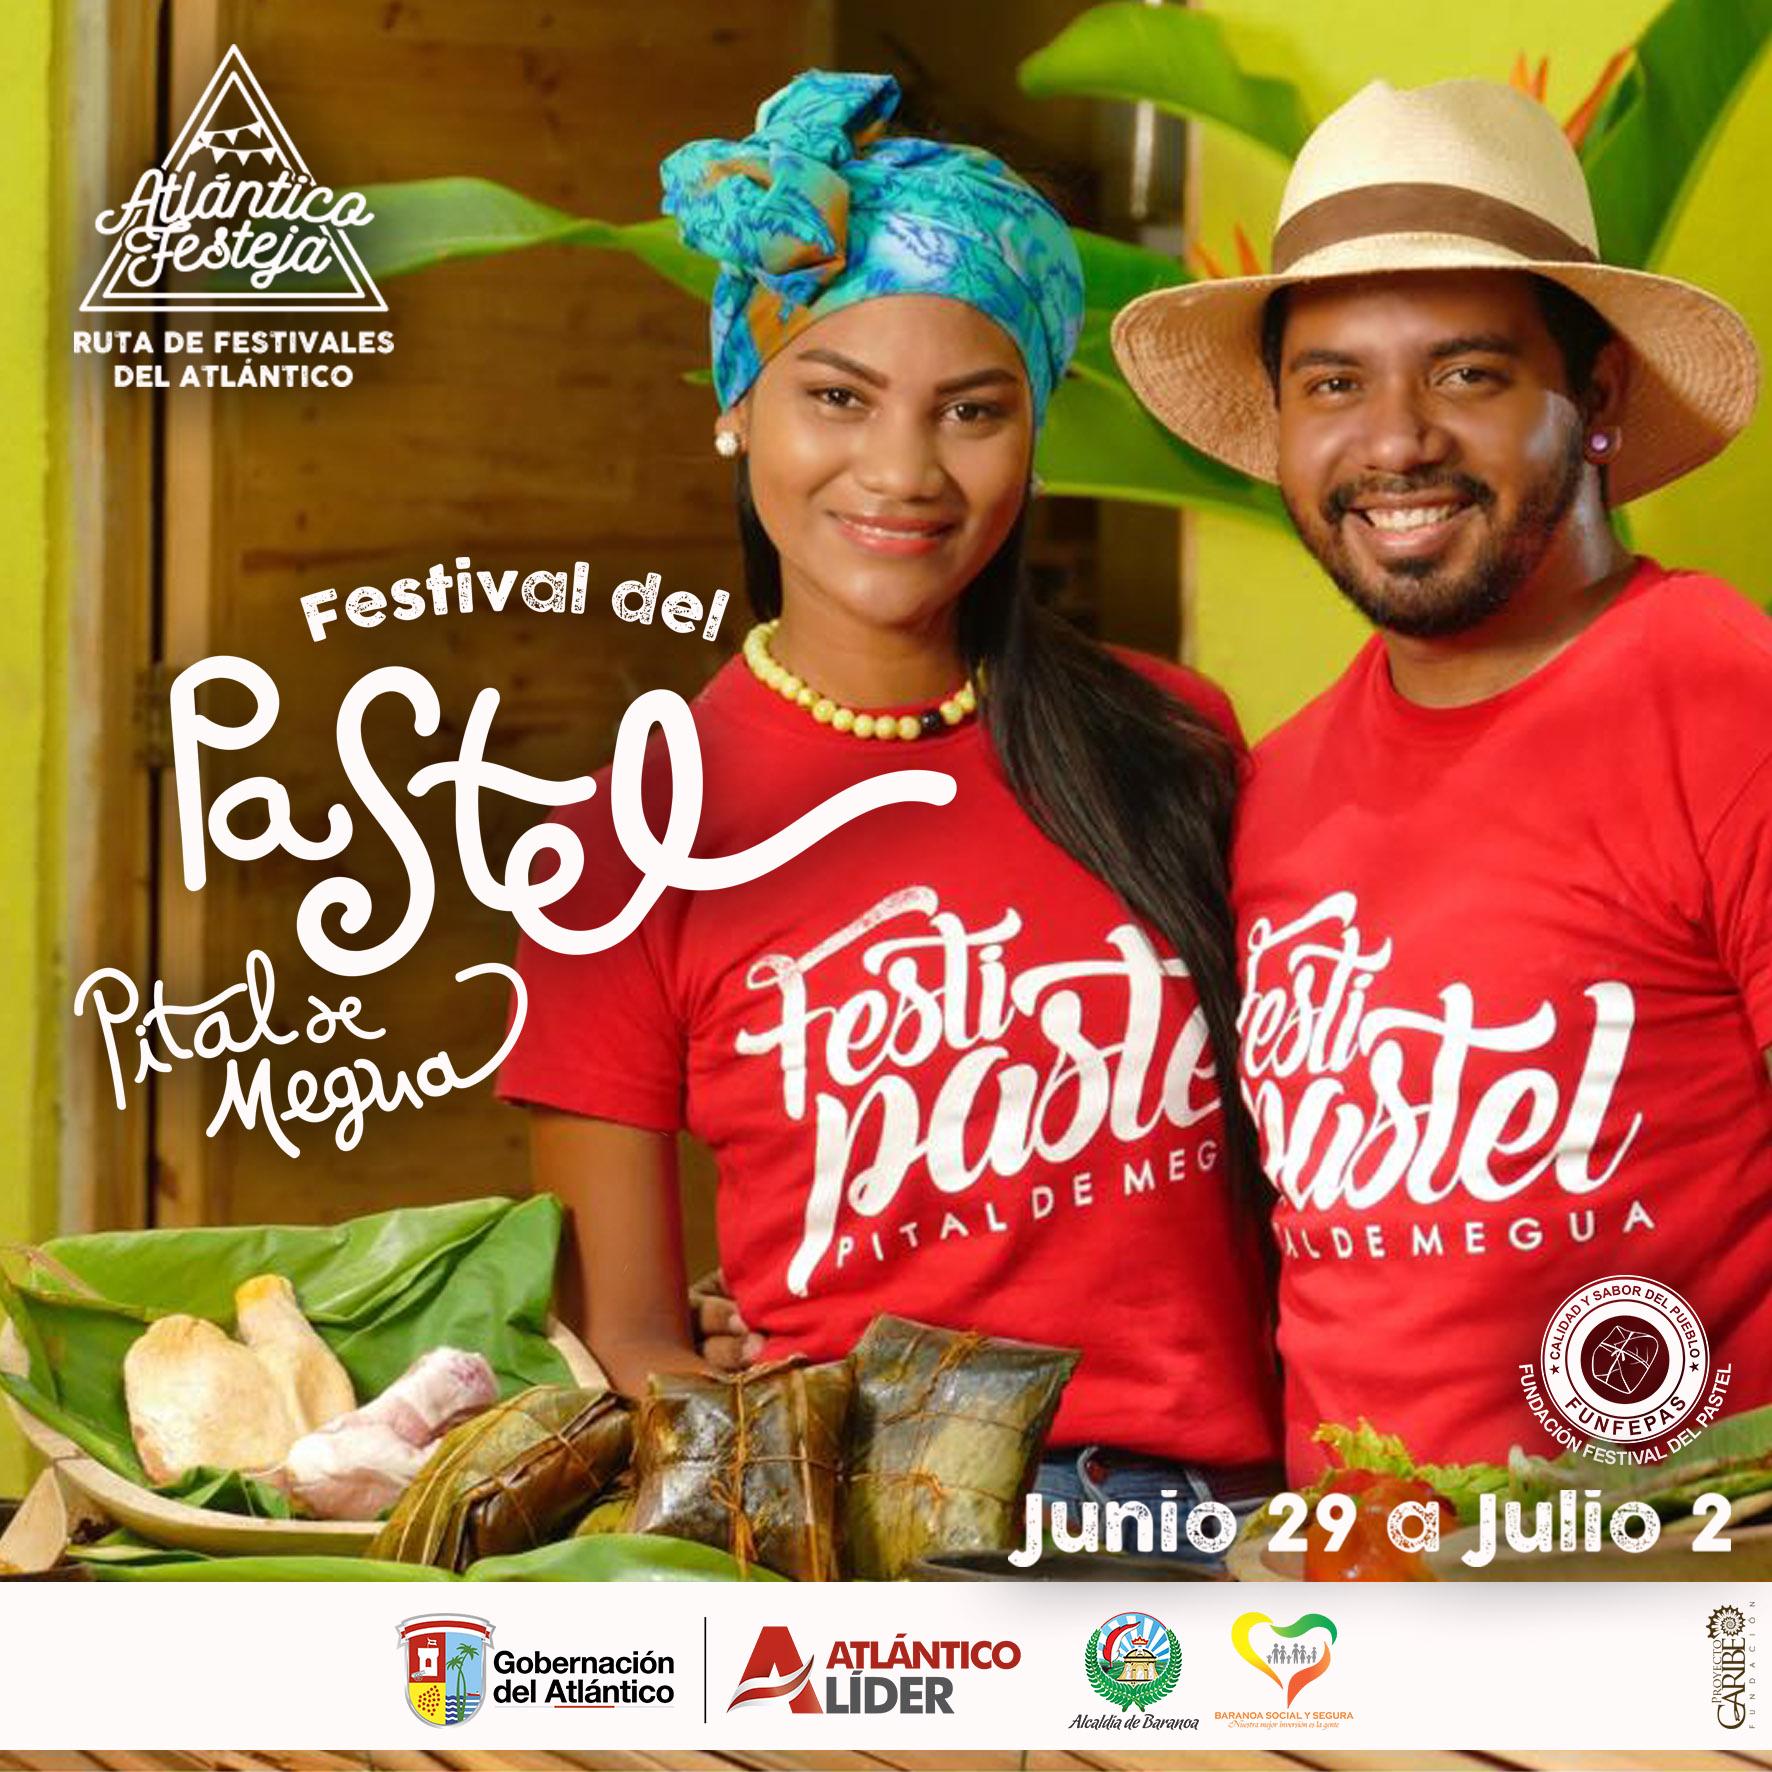 Festival del Pastel